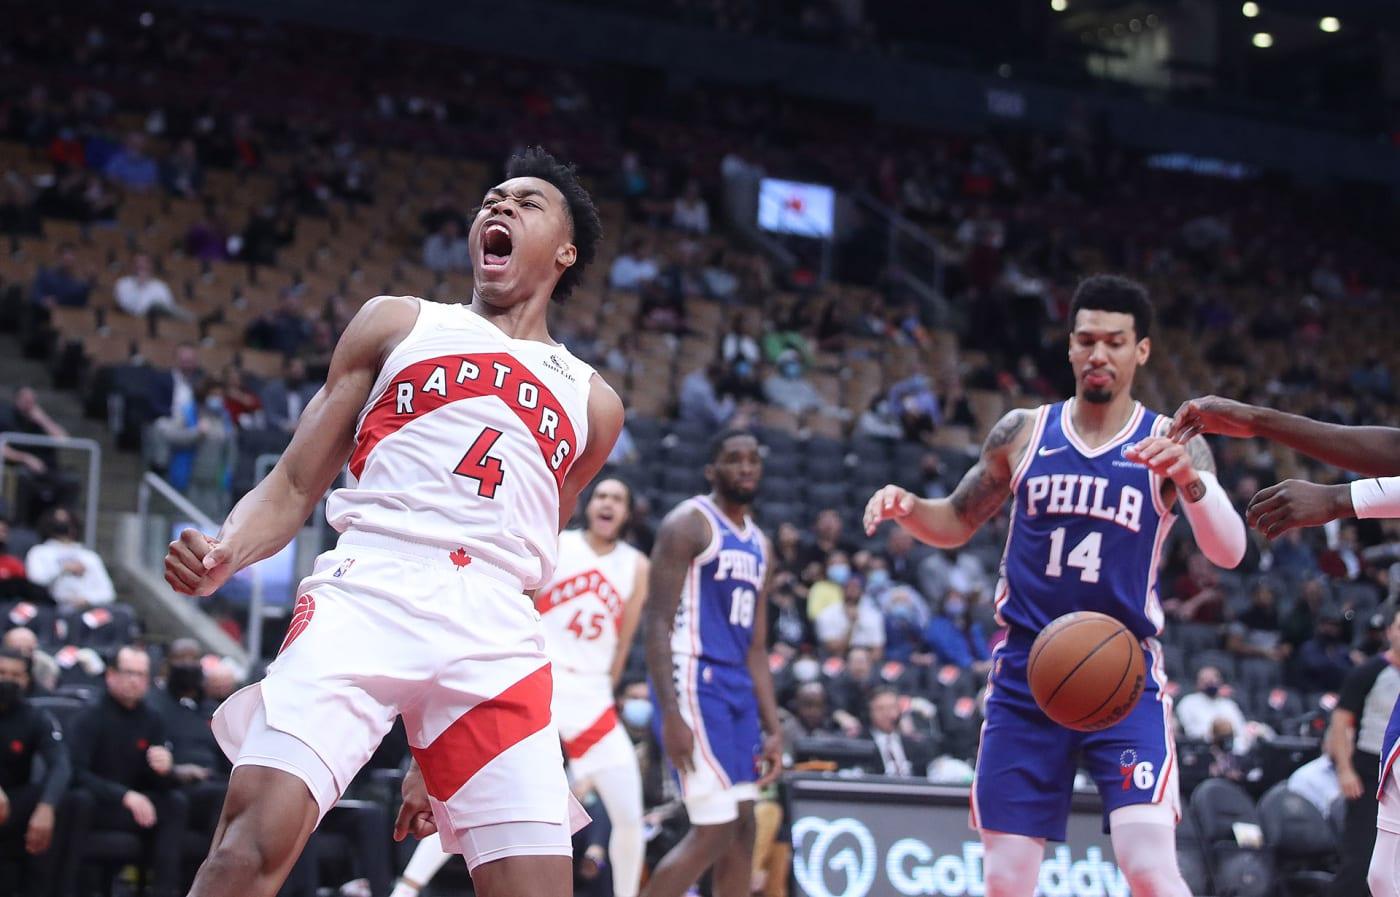 Toronto Raptors forward Scottie Barnes (4) celebrates a dunk as the Toronto Raptors play the Philadelphia 76ers in preseason action in Toronto. October 4, 2021.